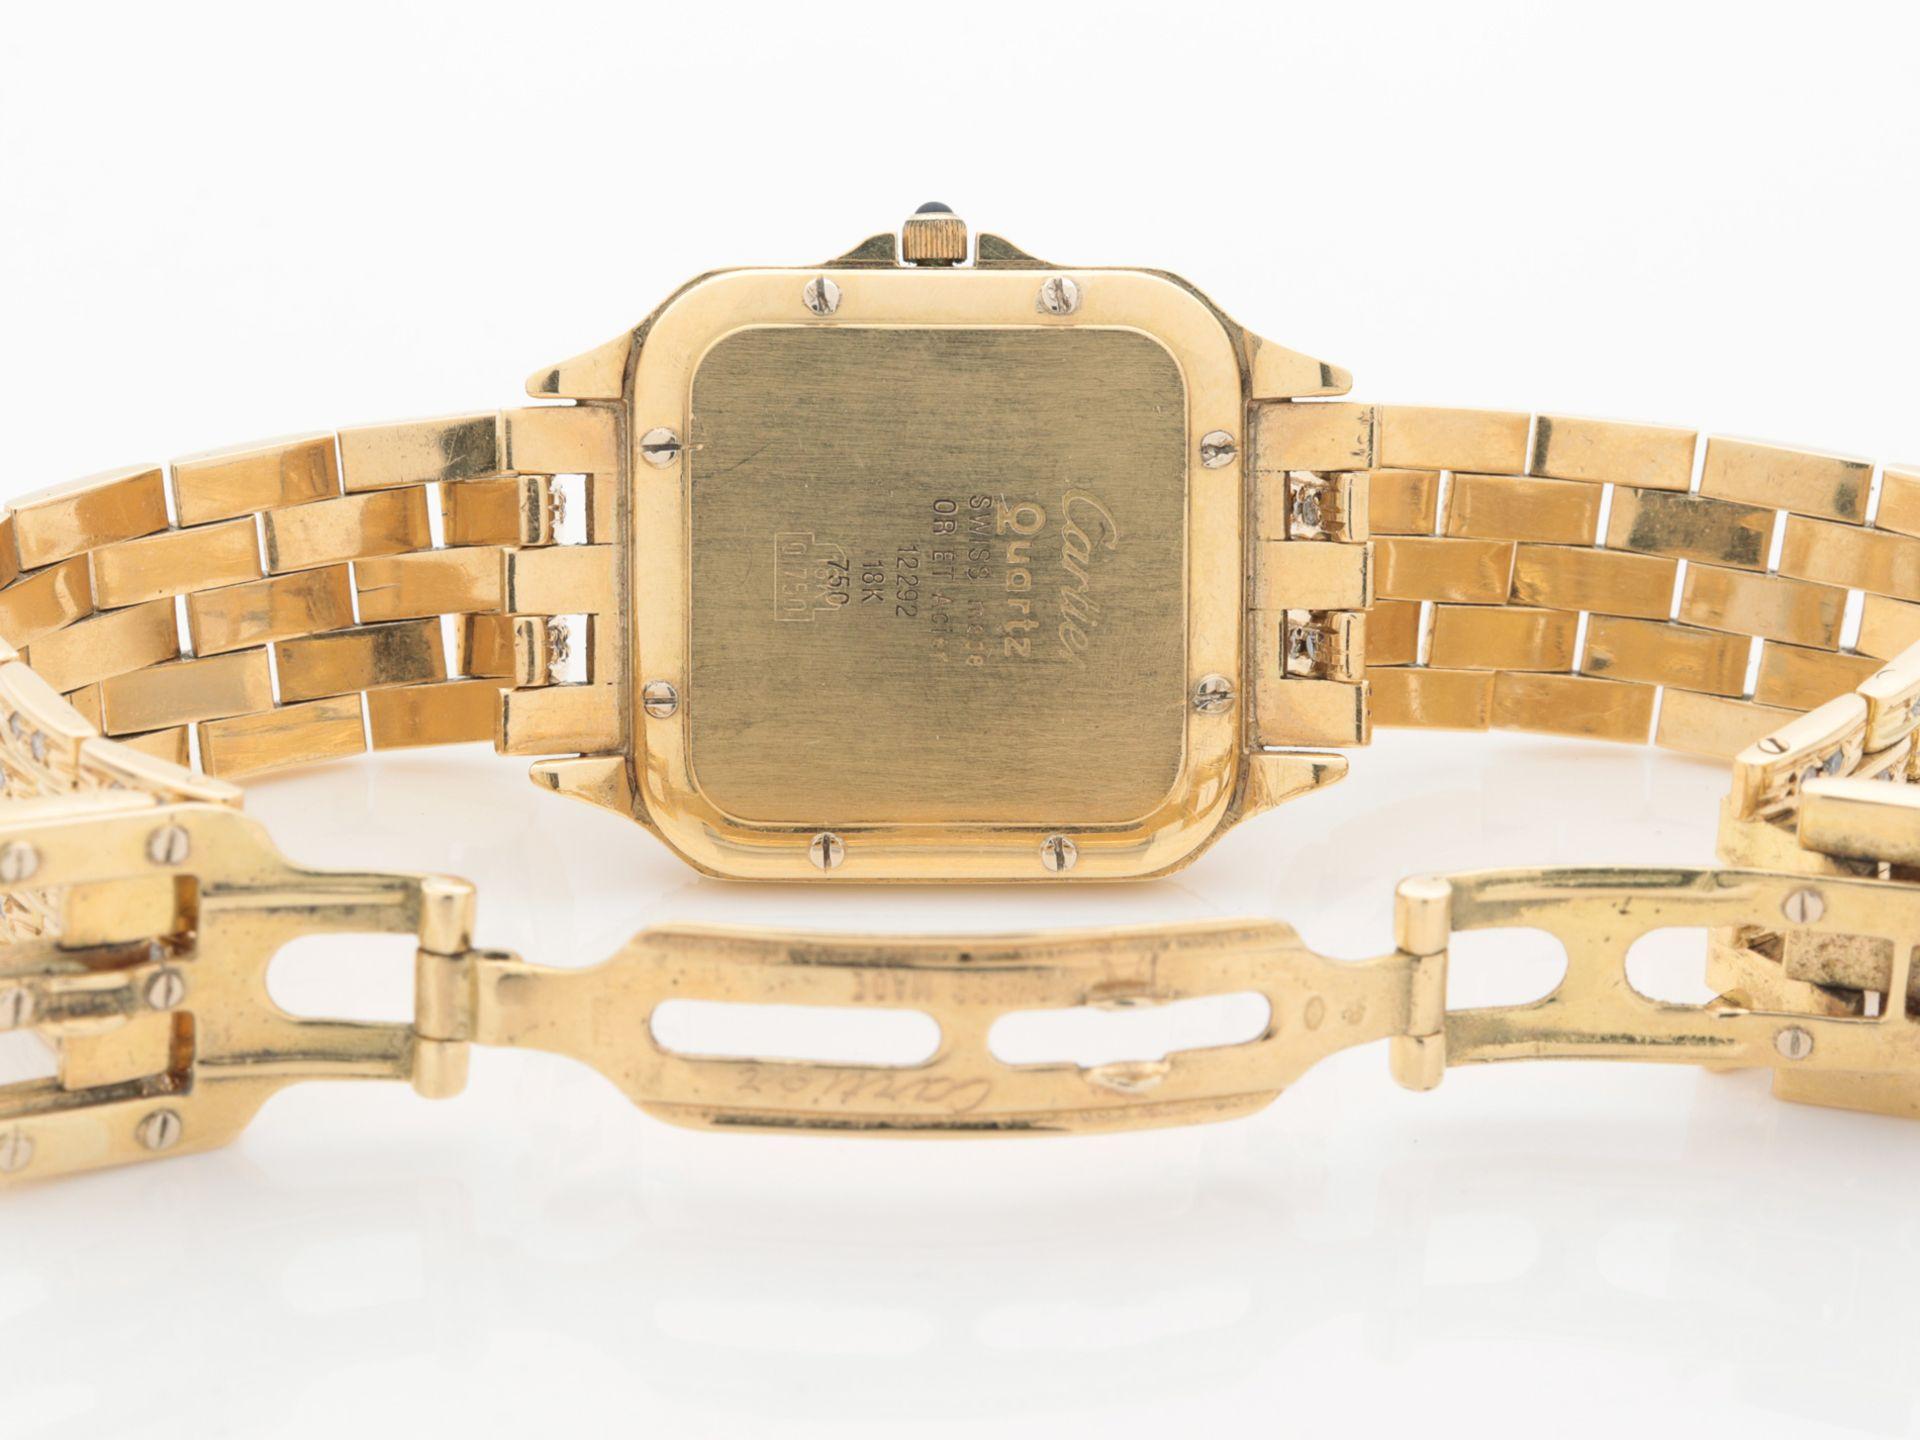 Cartier - Damenarmbanduhr - Image 9 of 14